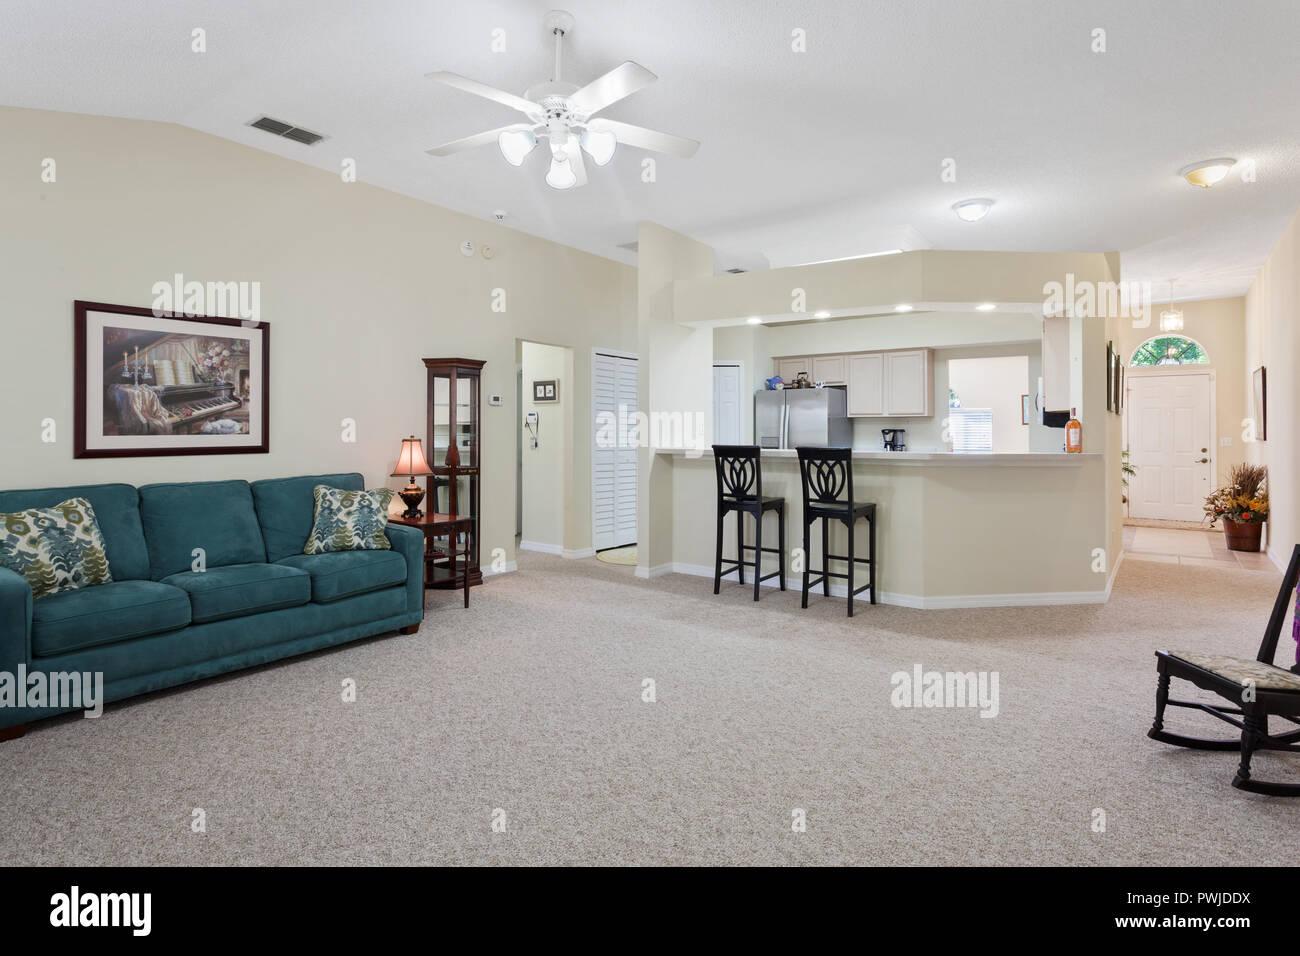 Livingroom interior - Stock Image